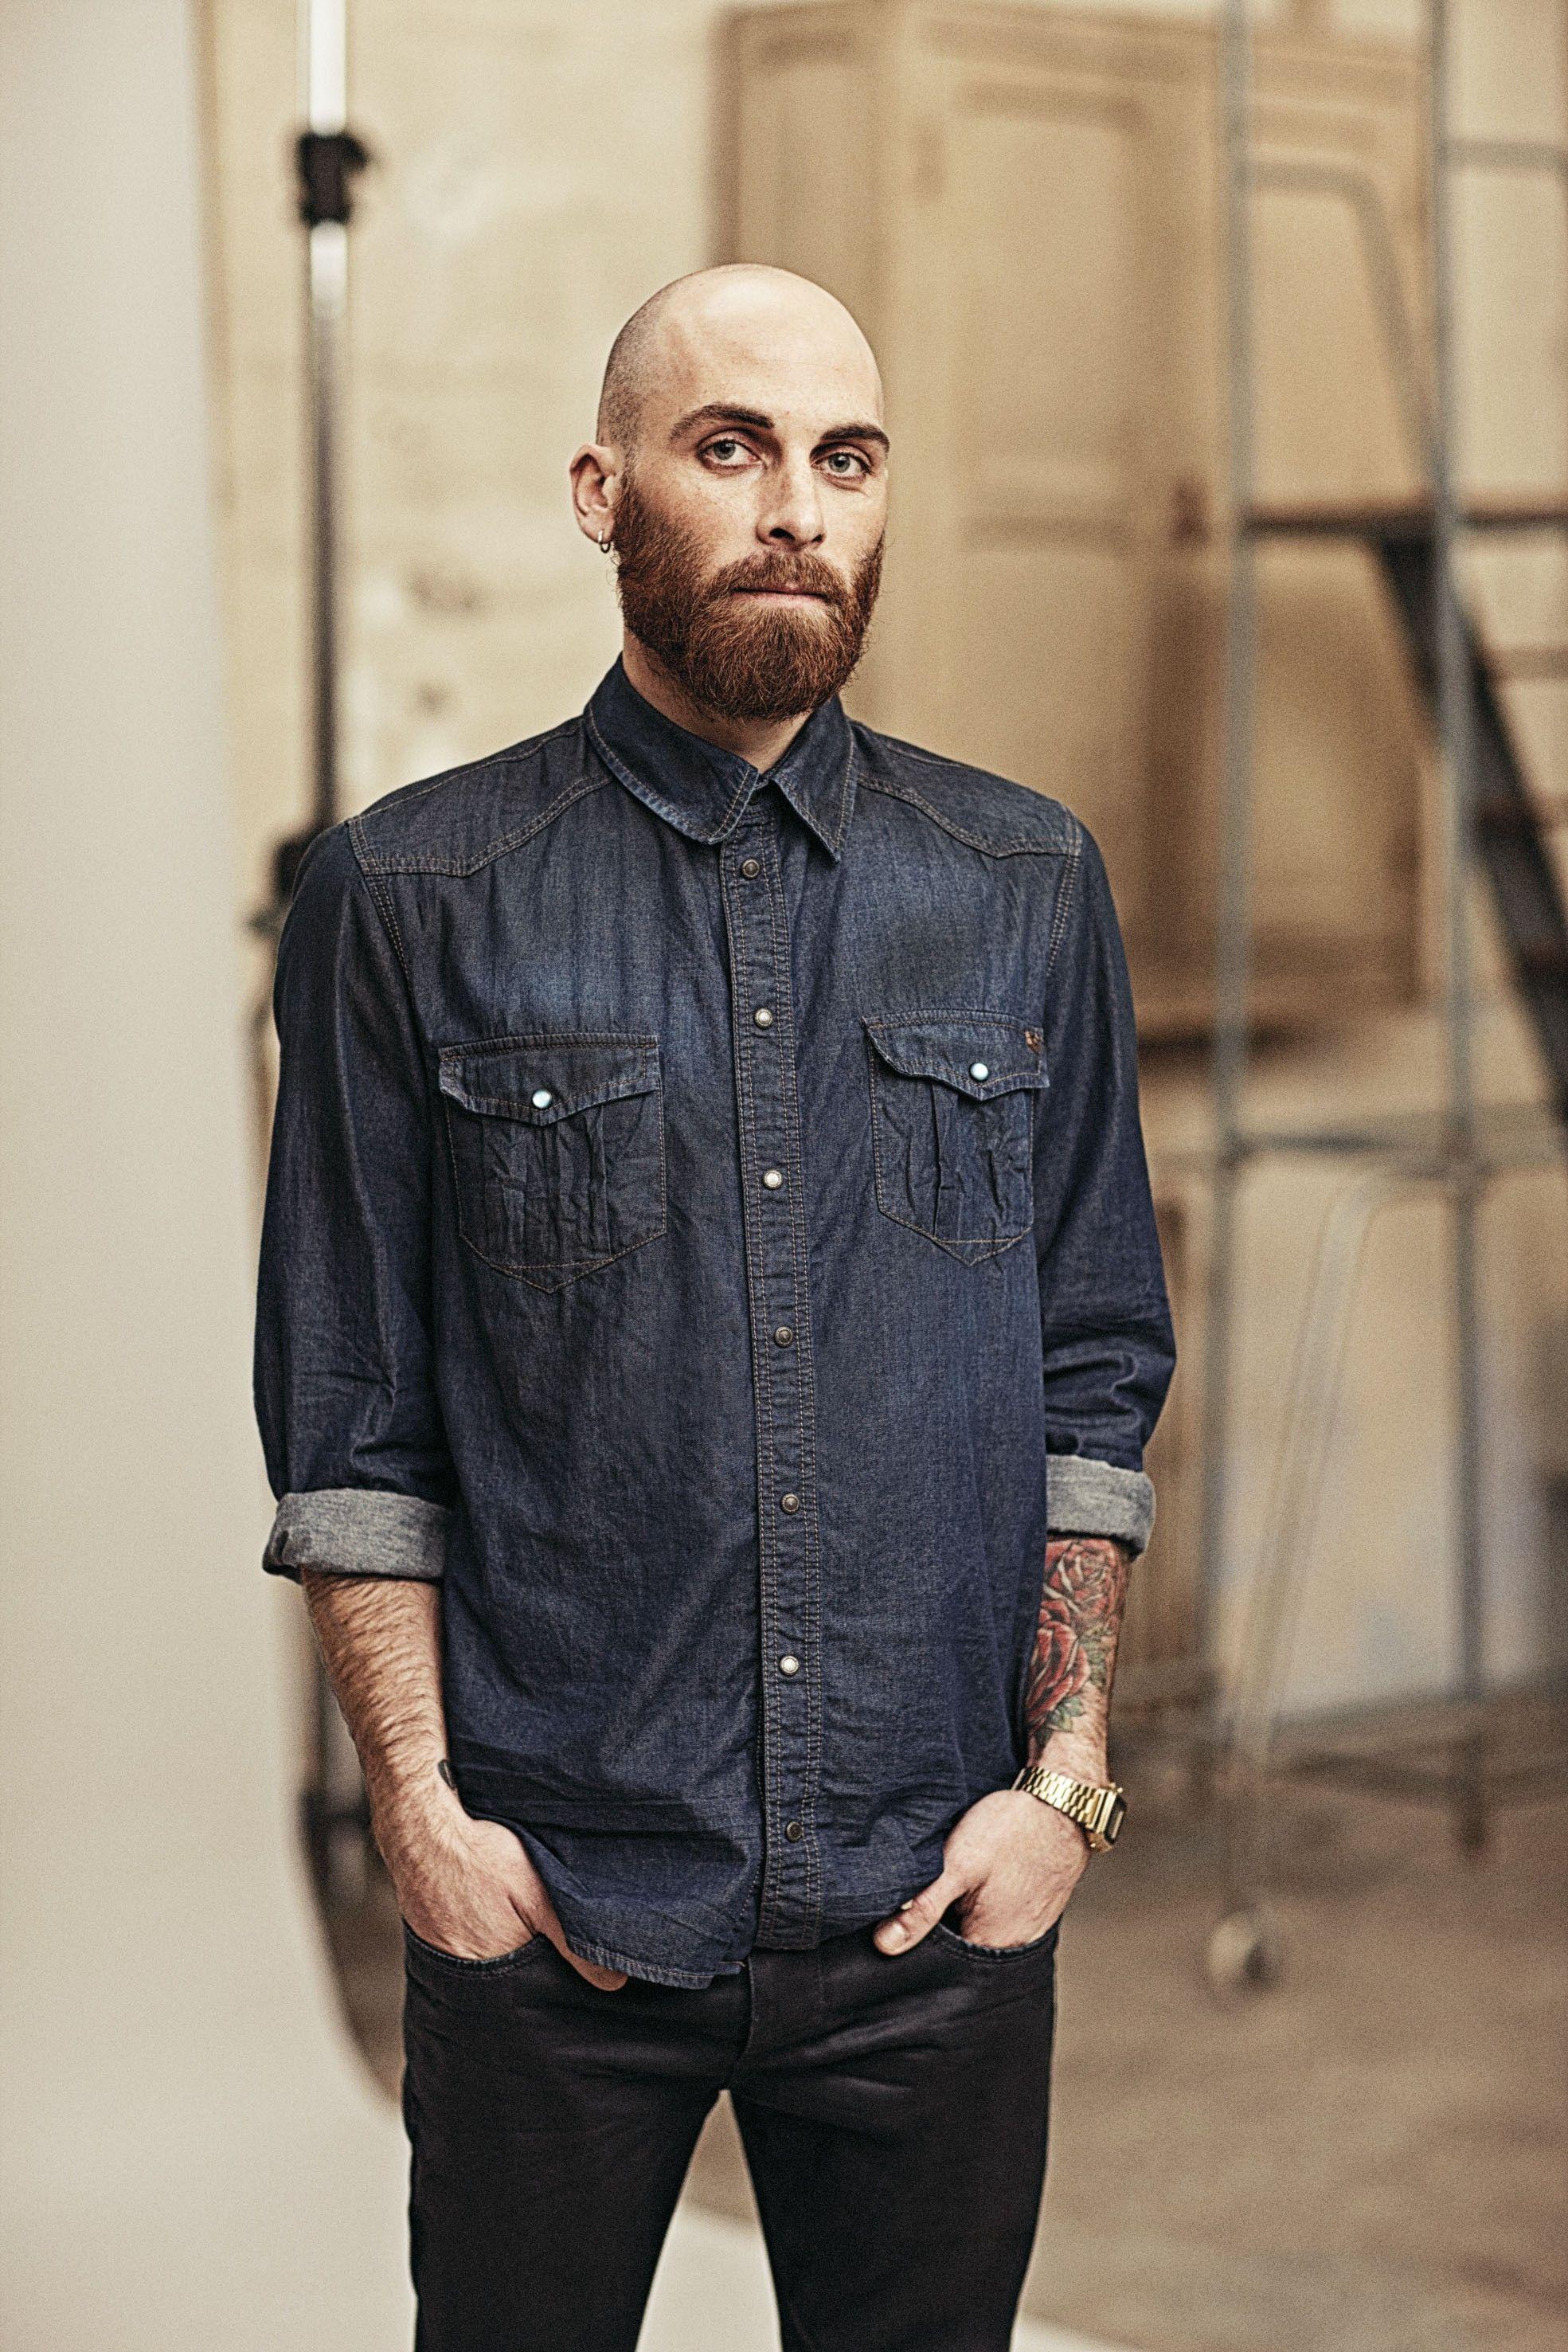 Lookbook Man Pe13 2 1 Jpg 1969 2953 Bald Men With Beards Bald Men Style Bald Men